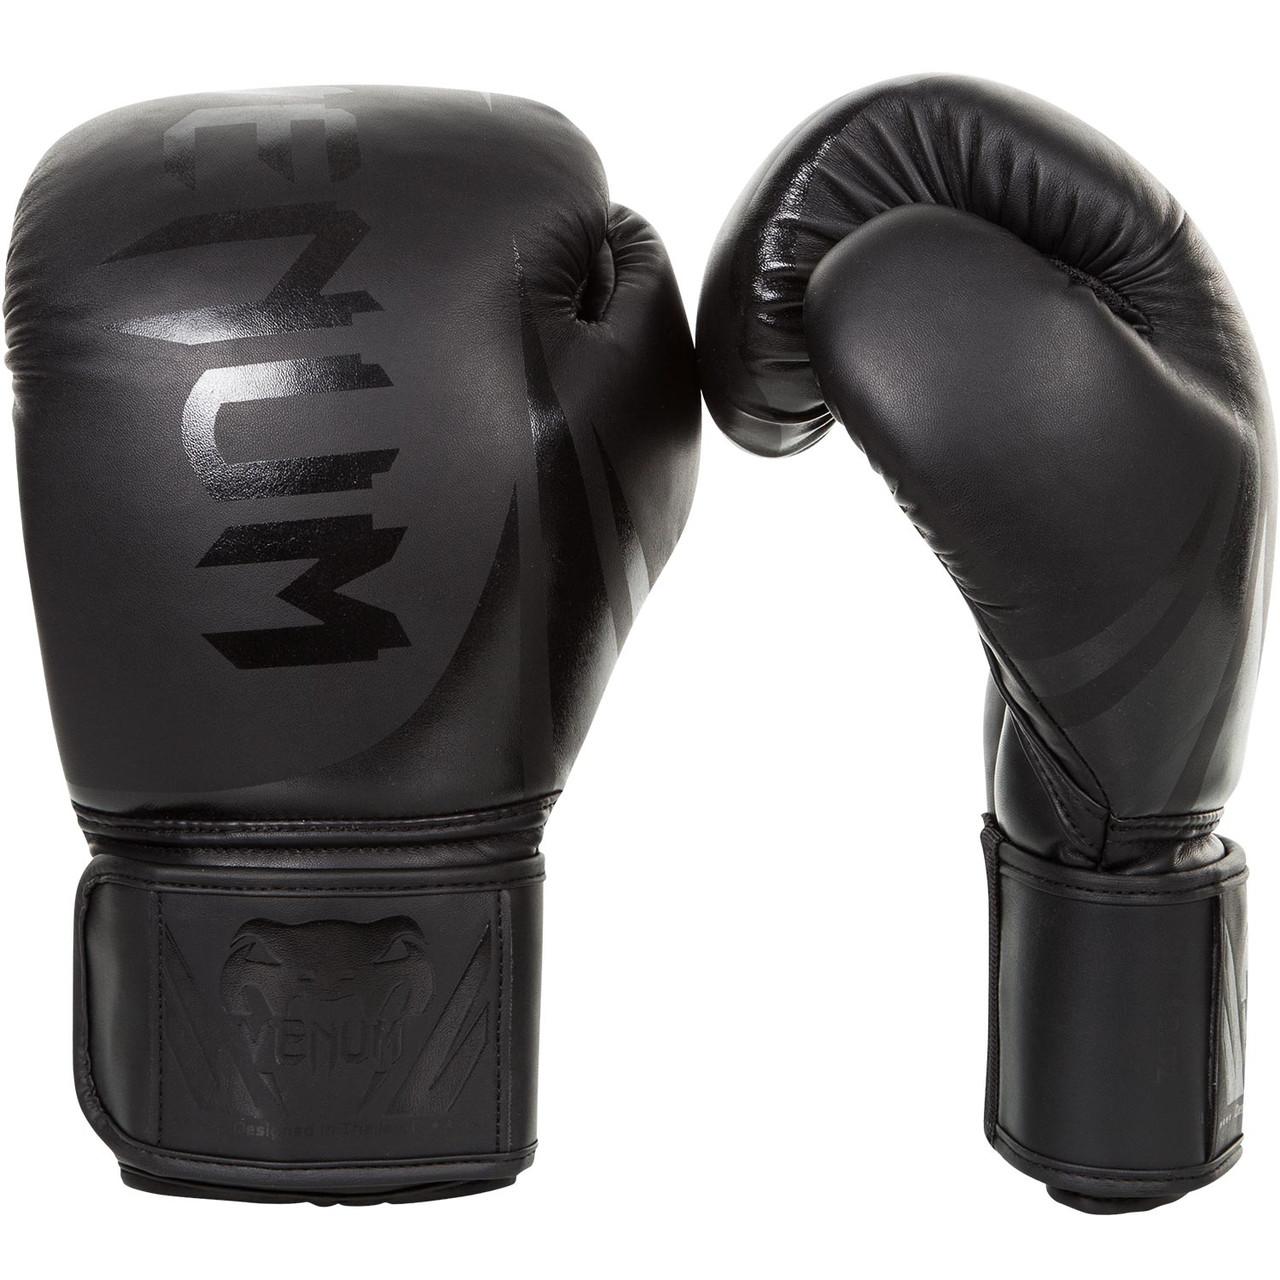 Перчатки боксерские Venum Challenger 2.0 Black Matte 12oz